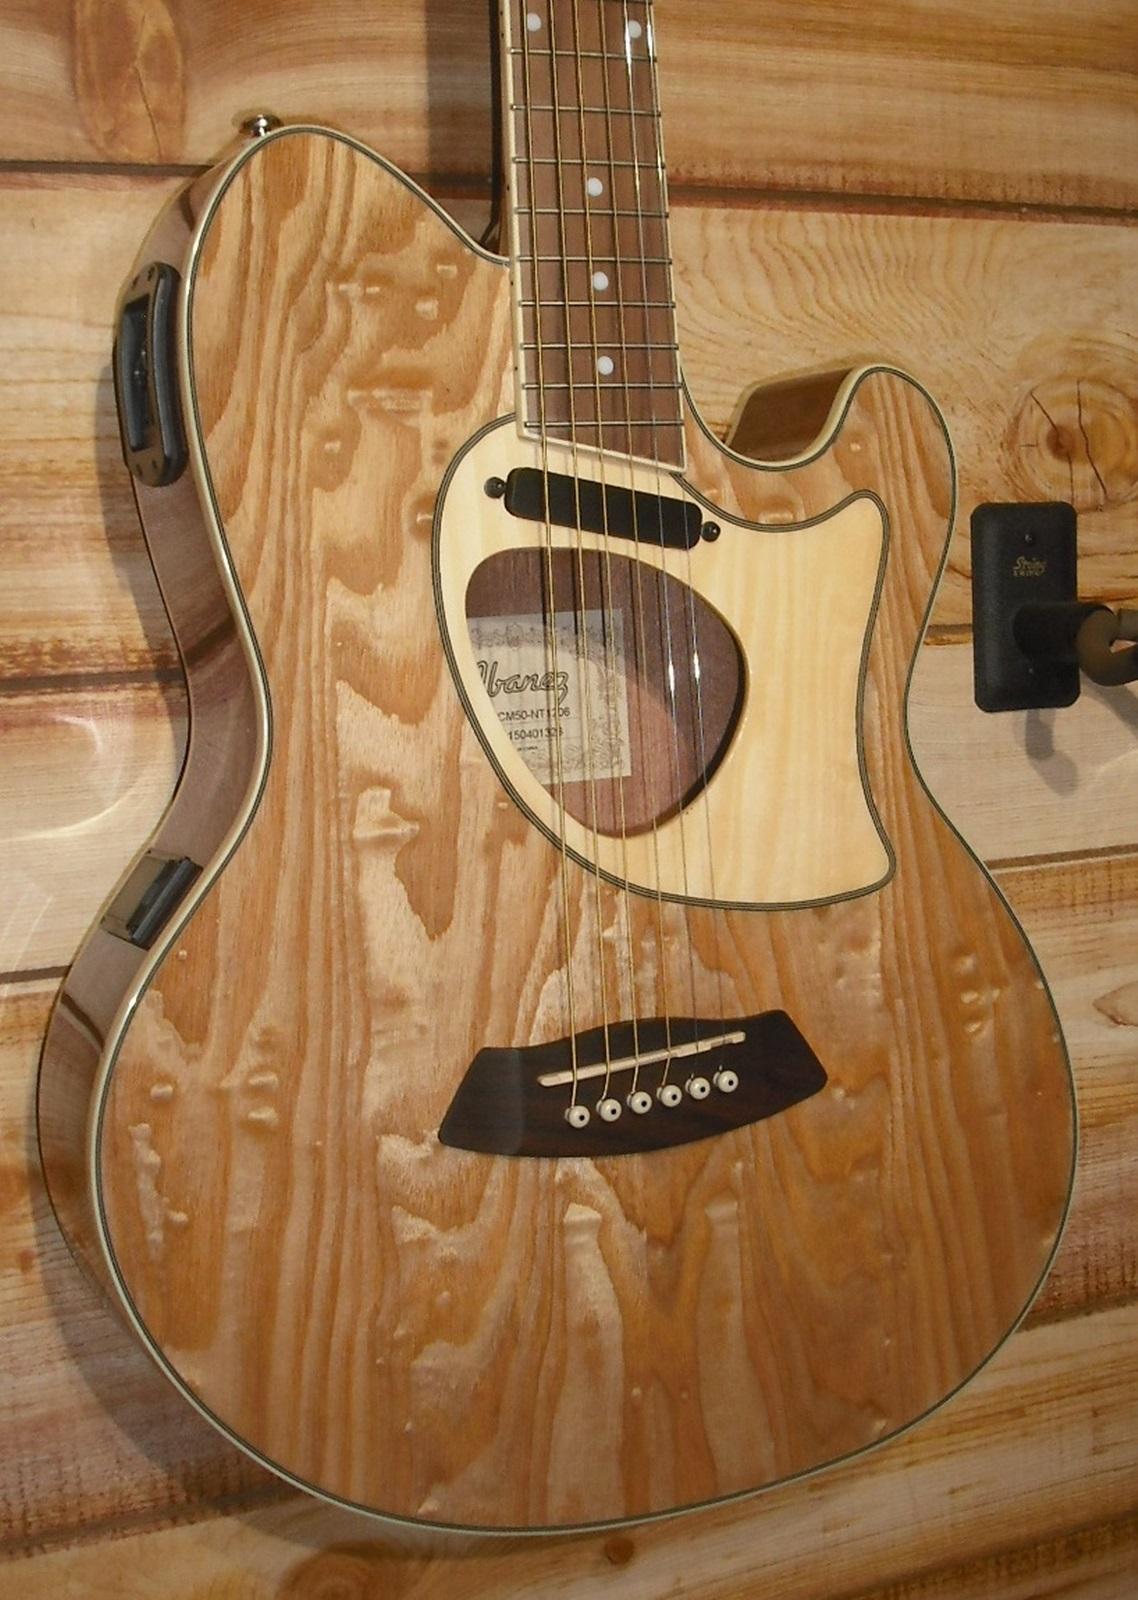 Ibanez Talman Tcm50 Acoustic Electric Guitar Natural High